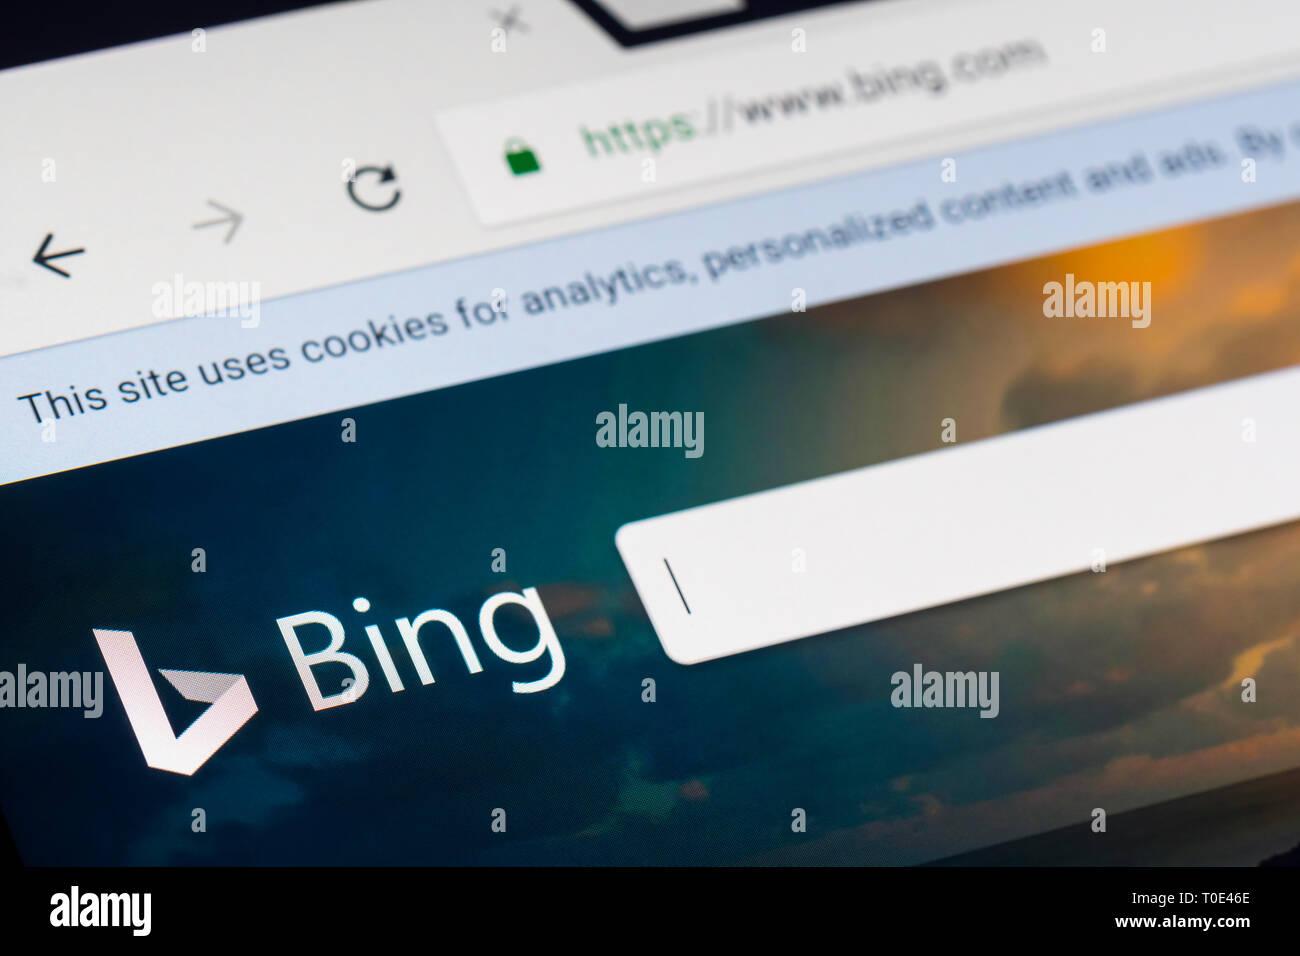 Bing Internet search engine website. - Stock Image